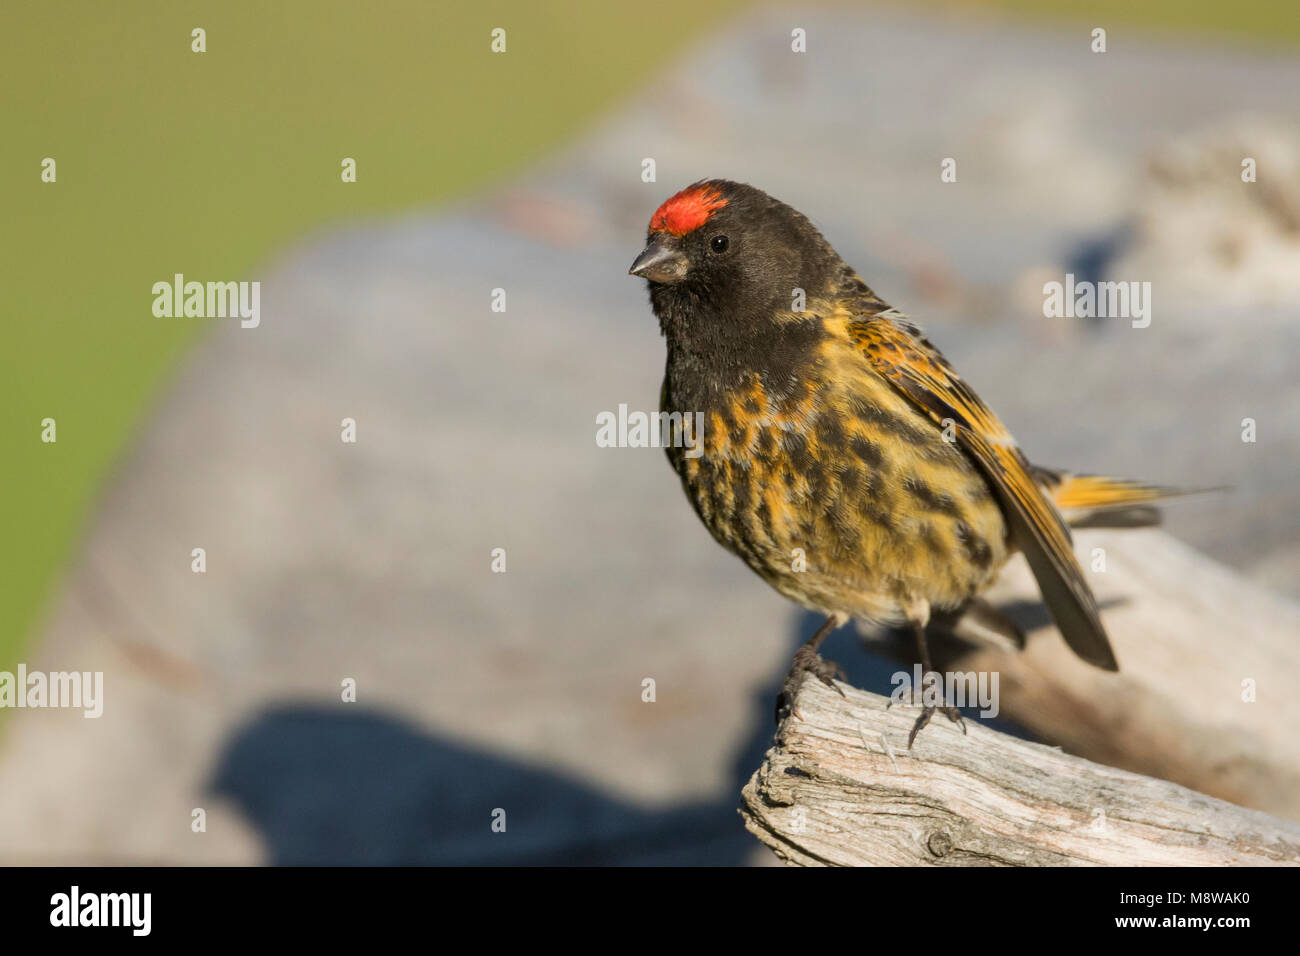 Red-fronted Serin - Rotstirngirlitz - Serinus pusillus: Kyrgyzstan - Stock Image